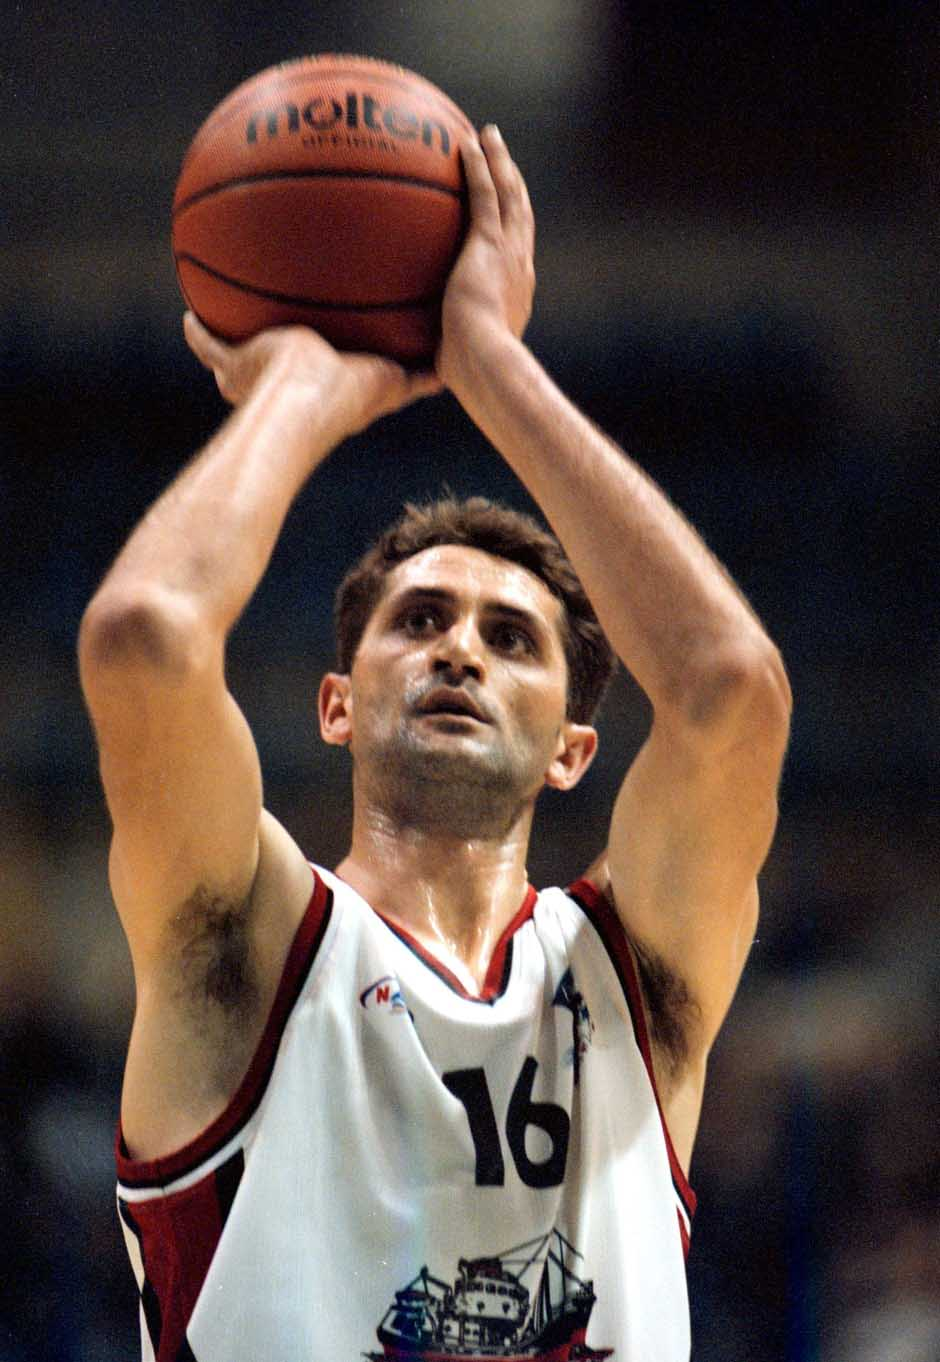 KOSARKA - Mijailo Grusanovic, kosarkas Iva Zorka Farme, na All - star mecu Plavi - Beli. BGD, 27.12.1997. snimio:N.Parausic